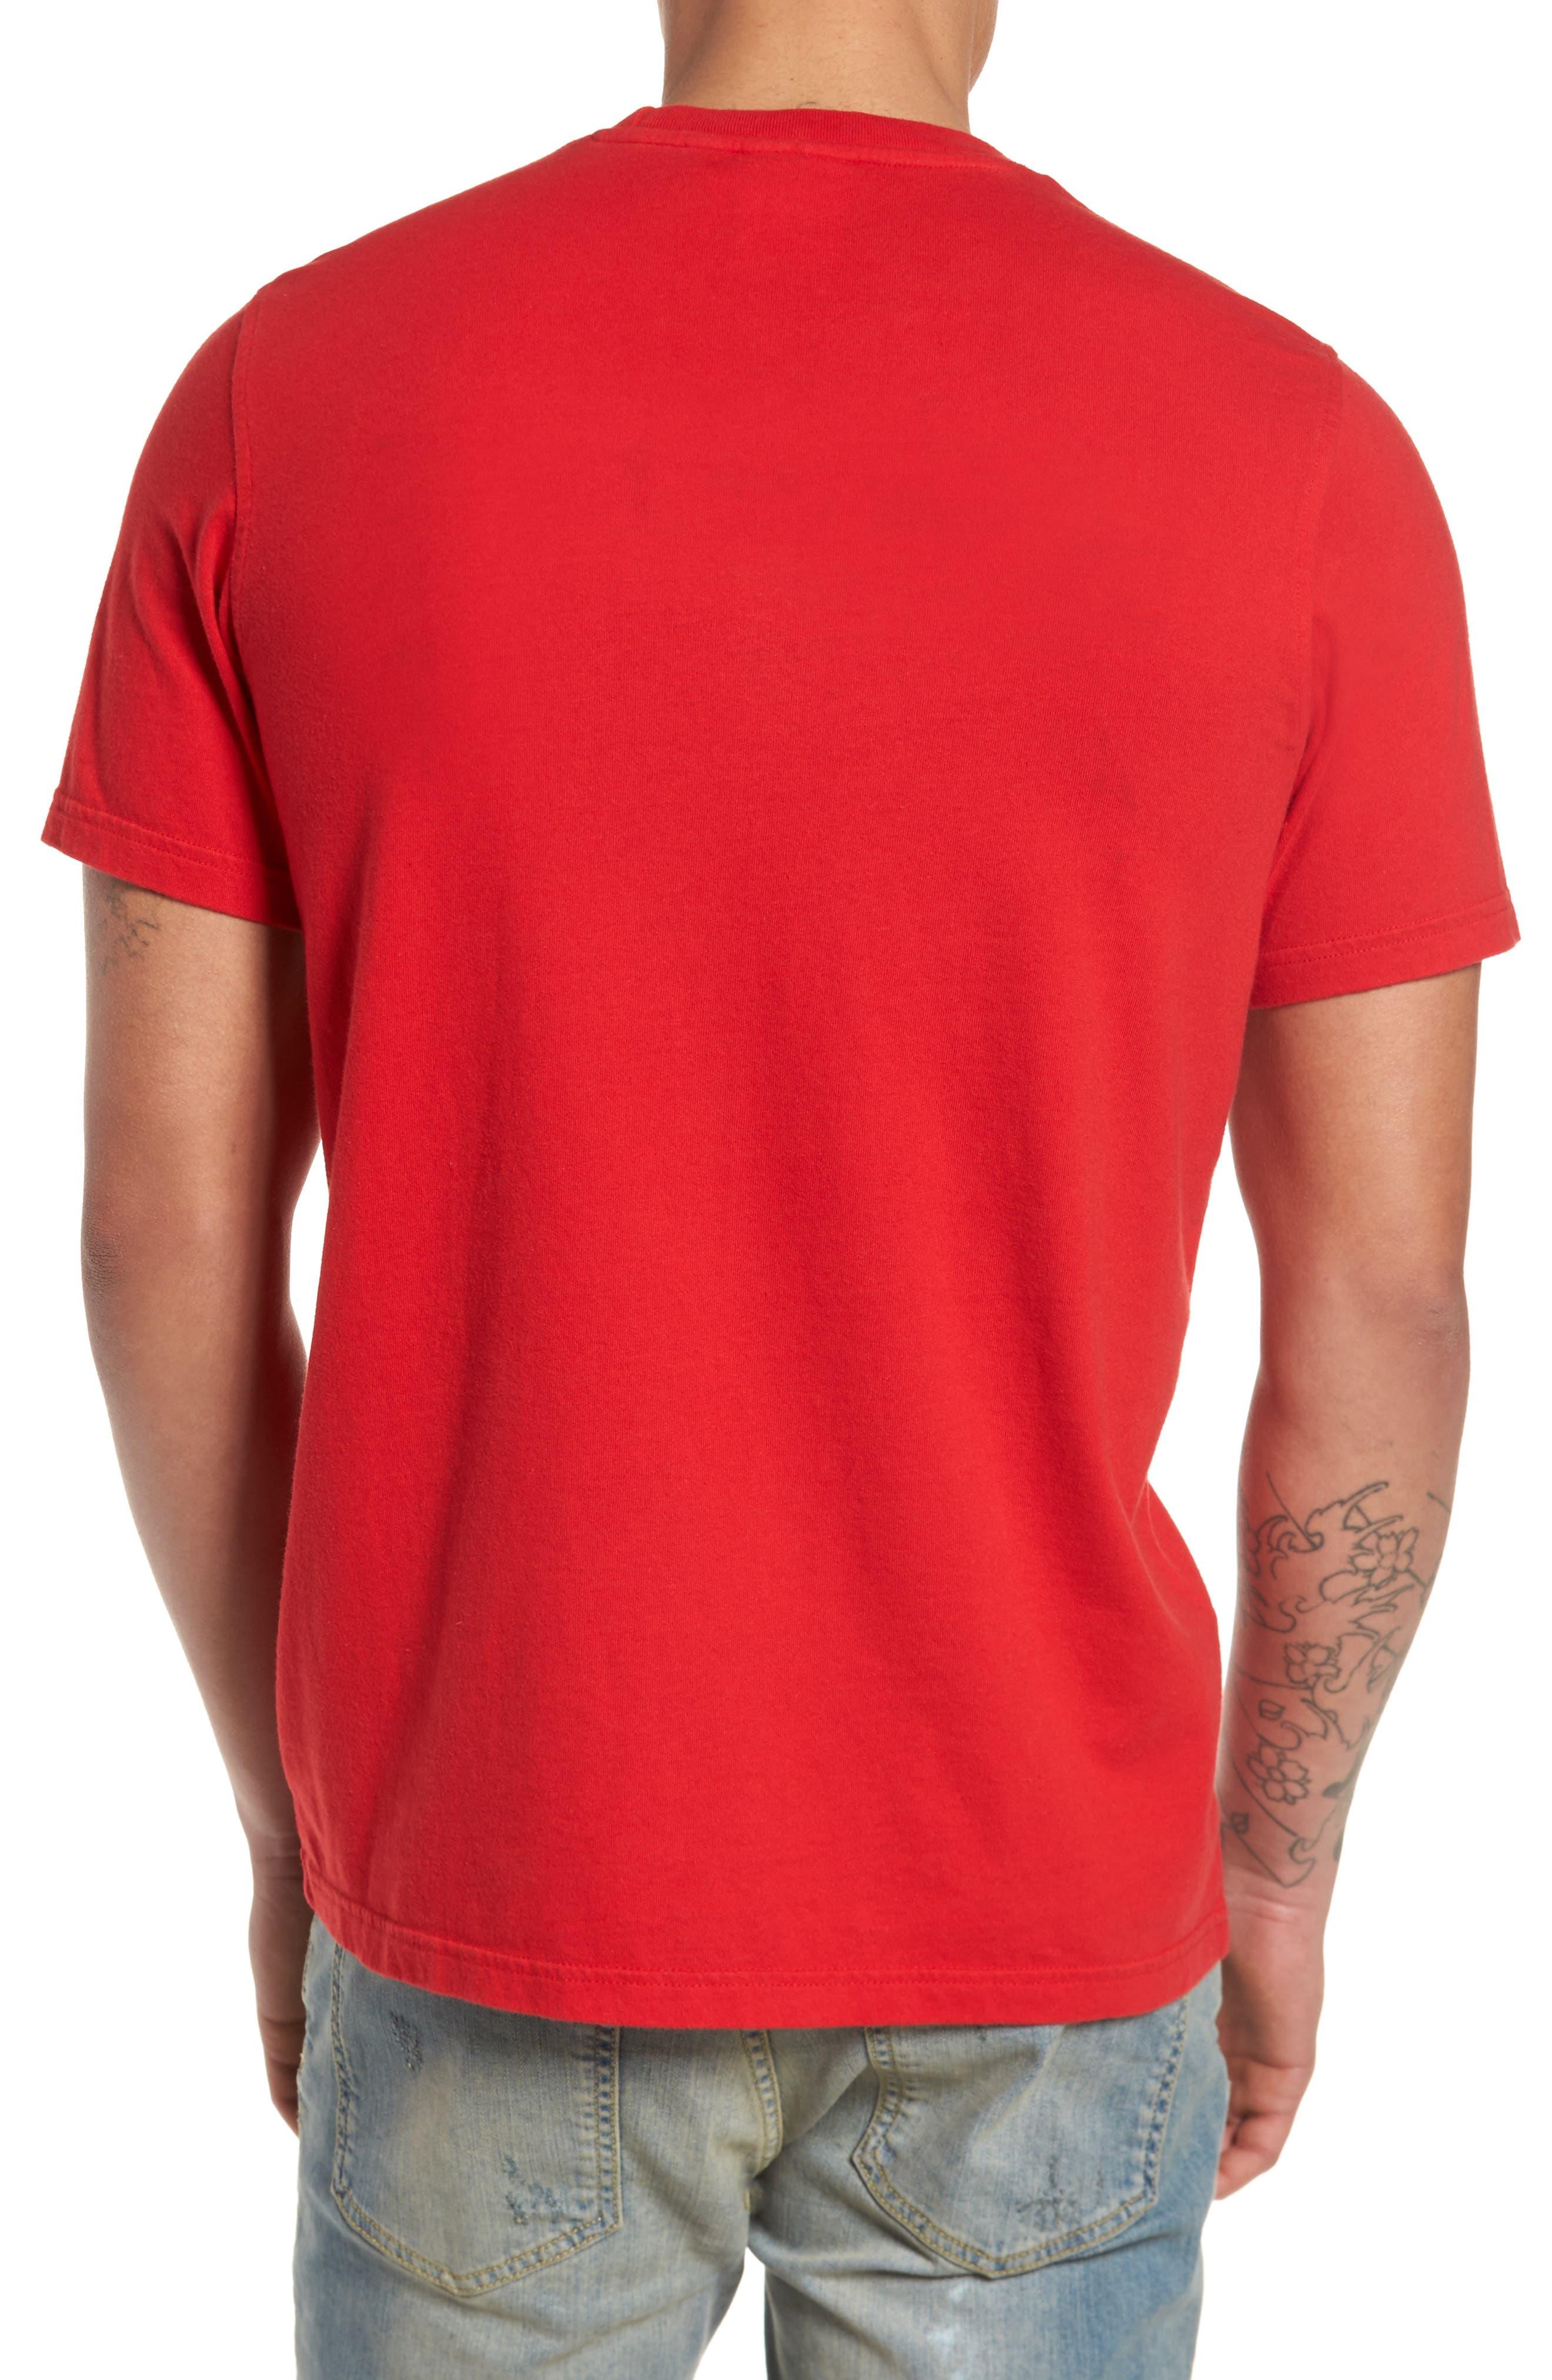 Alternate Image 2  - adidas Originals Trefoil T-Shirt